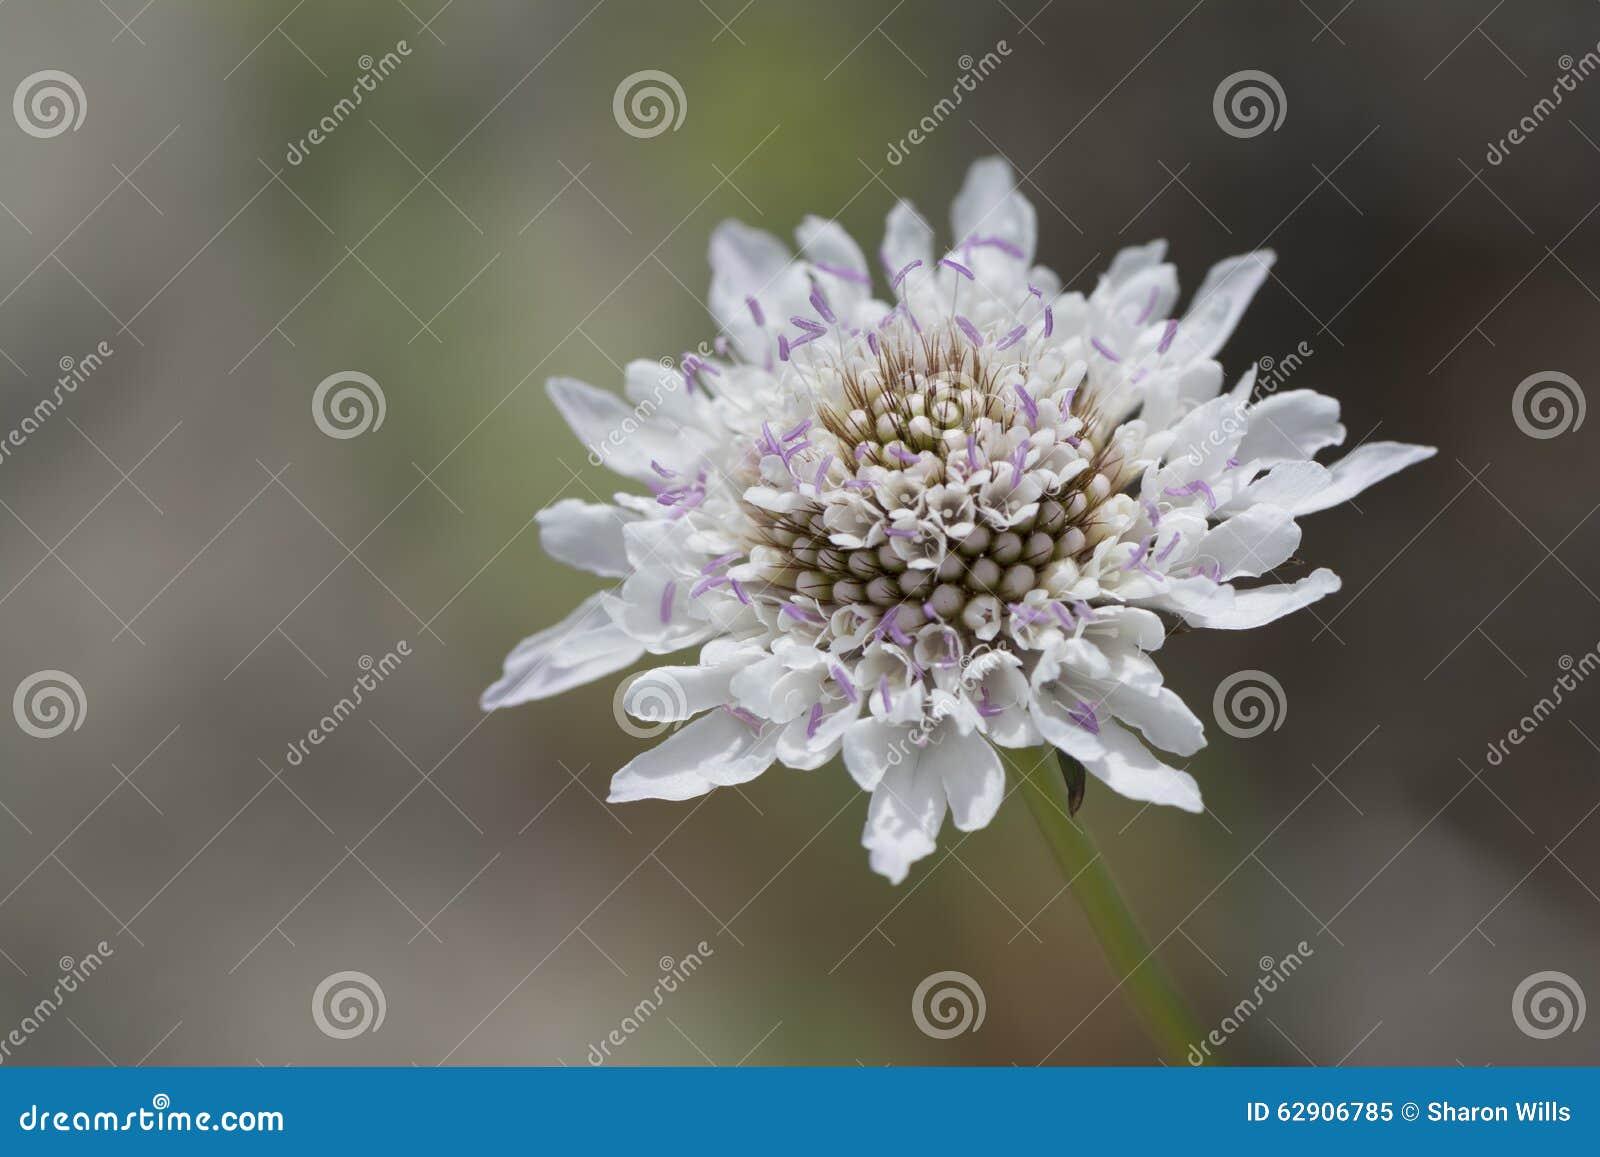 White Scabiosa Pincushion Flower Head Stock Image Image Of